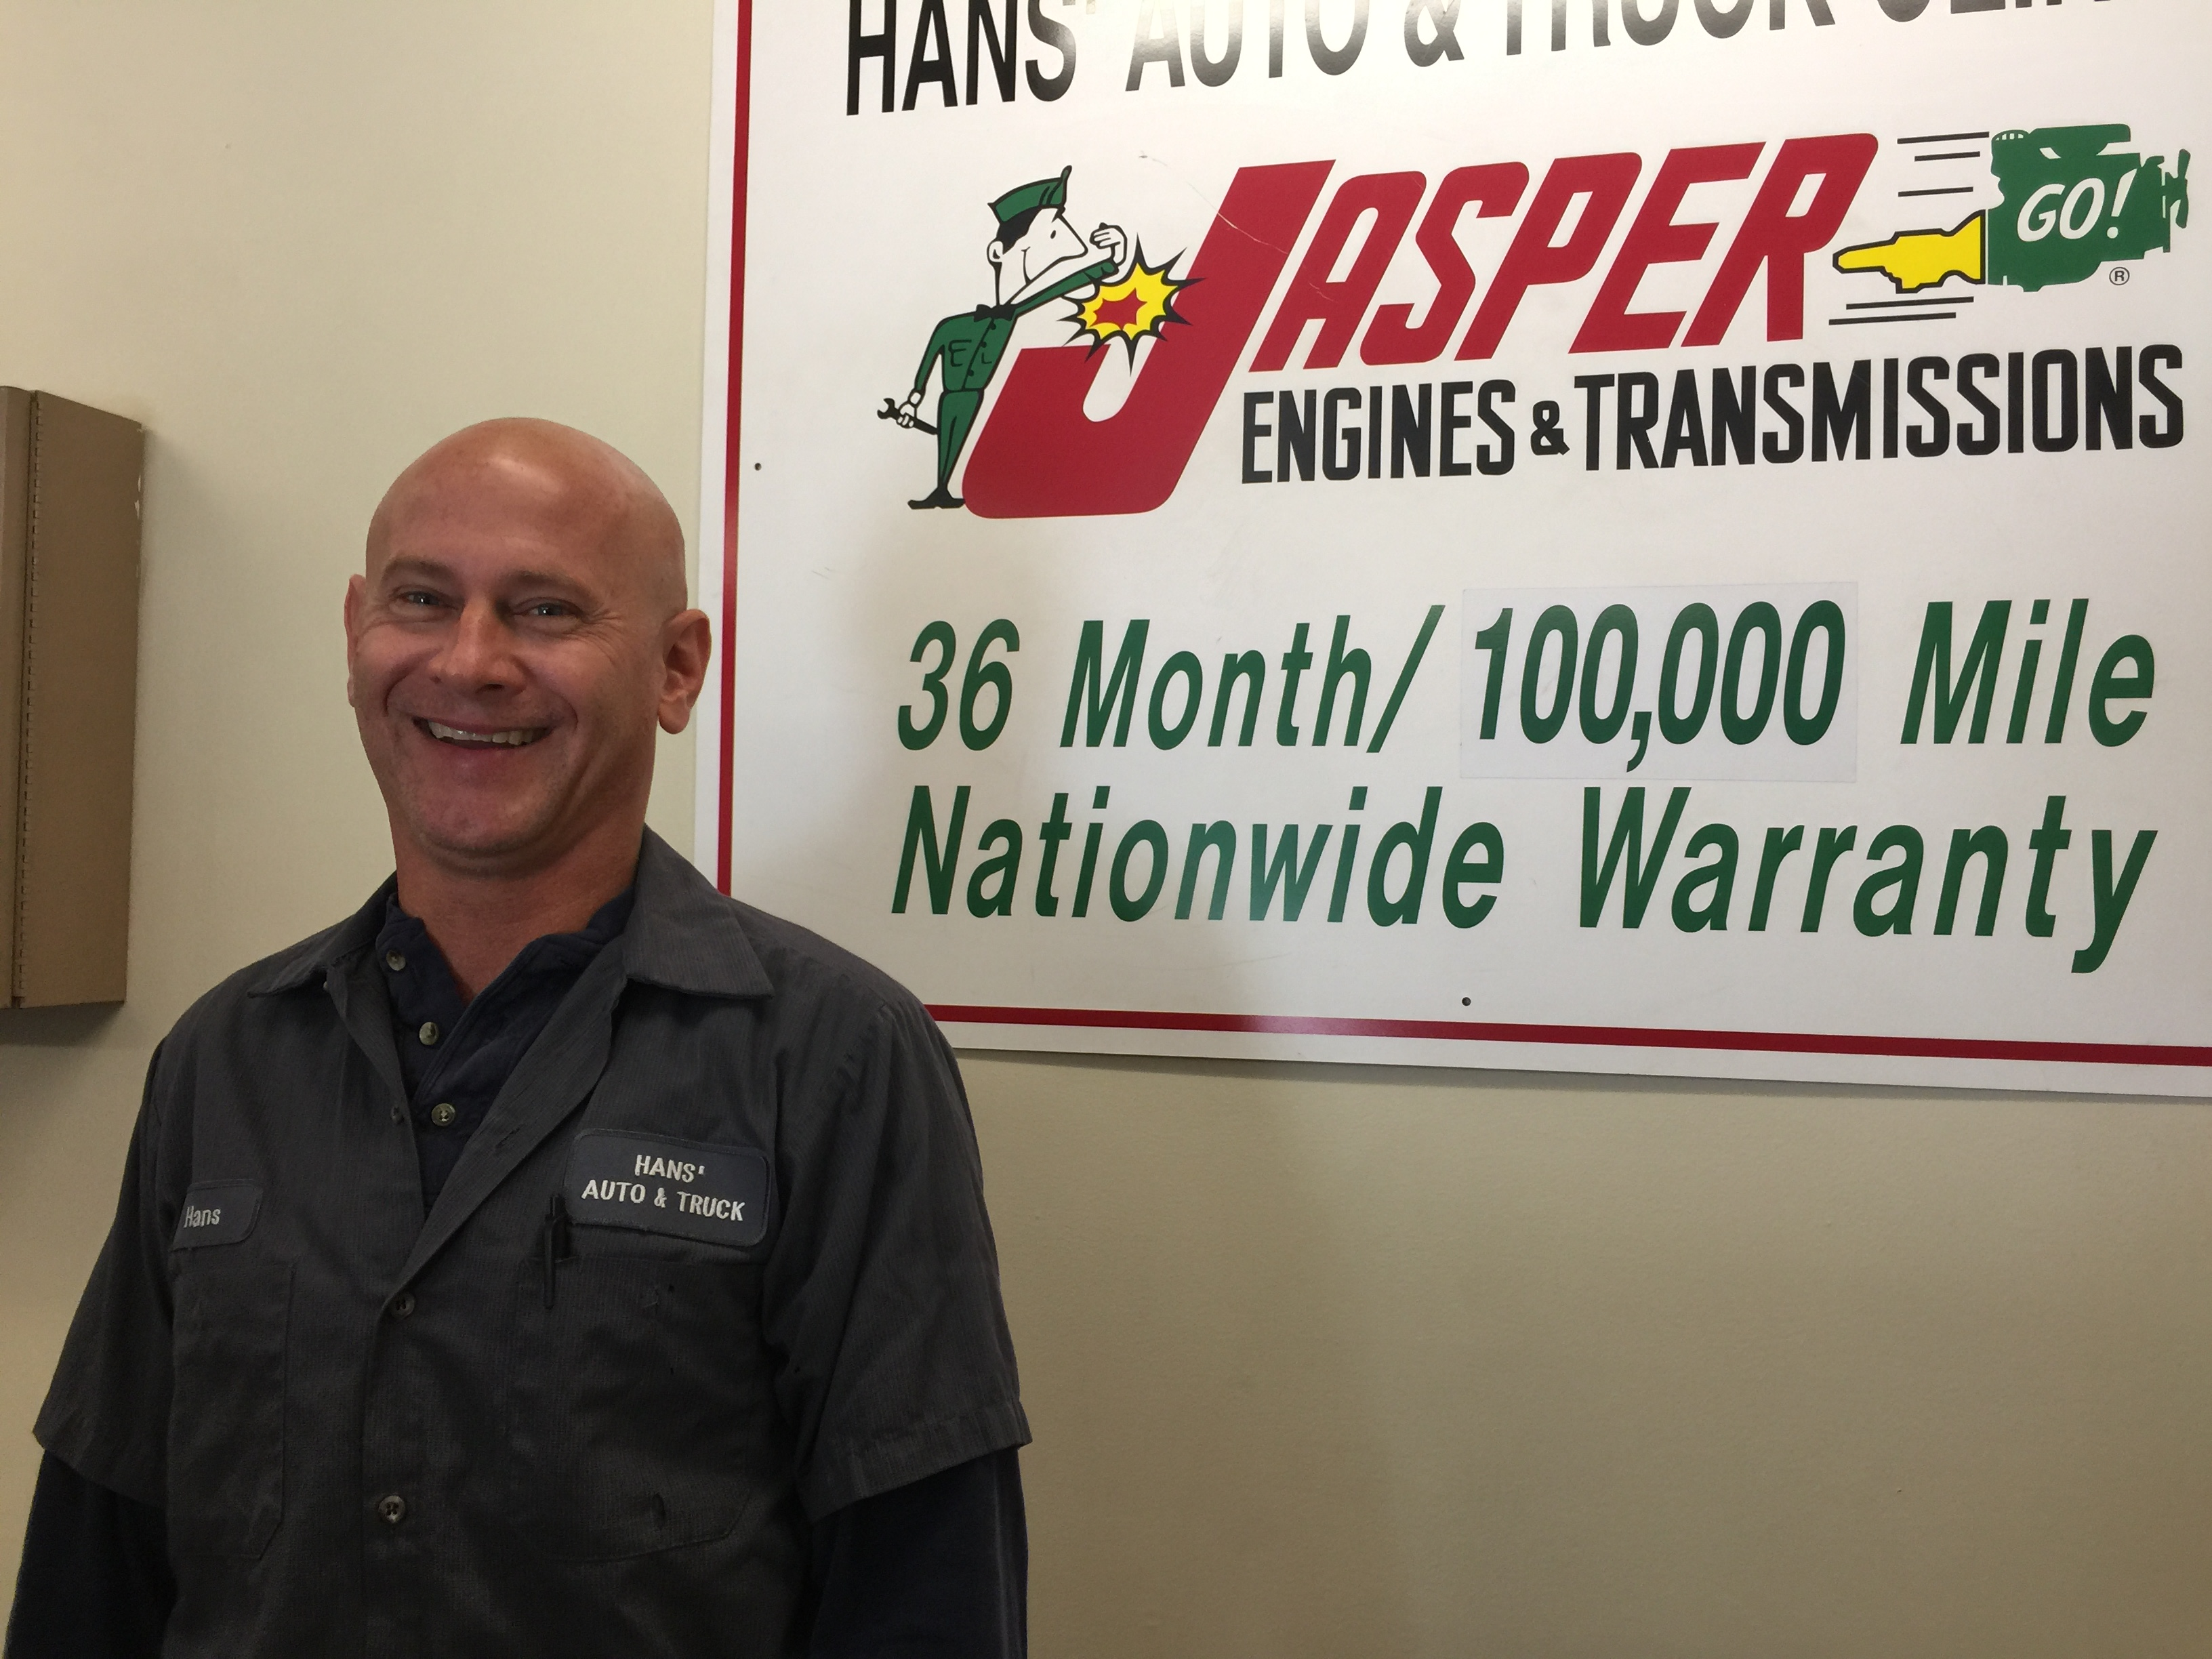 Hans' Auto & Truck Clinic image 1